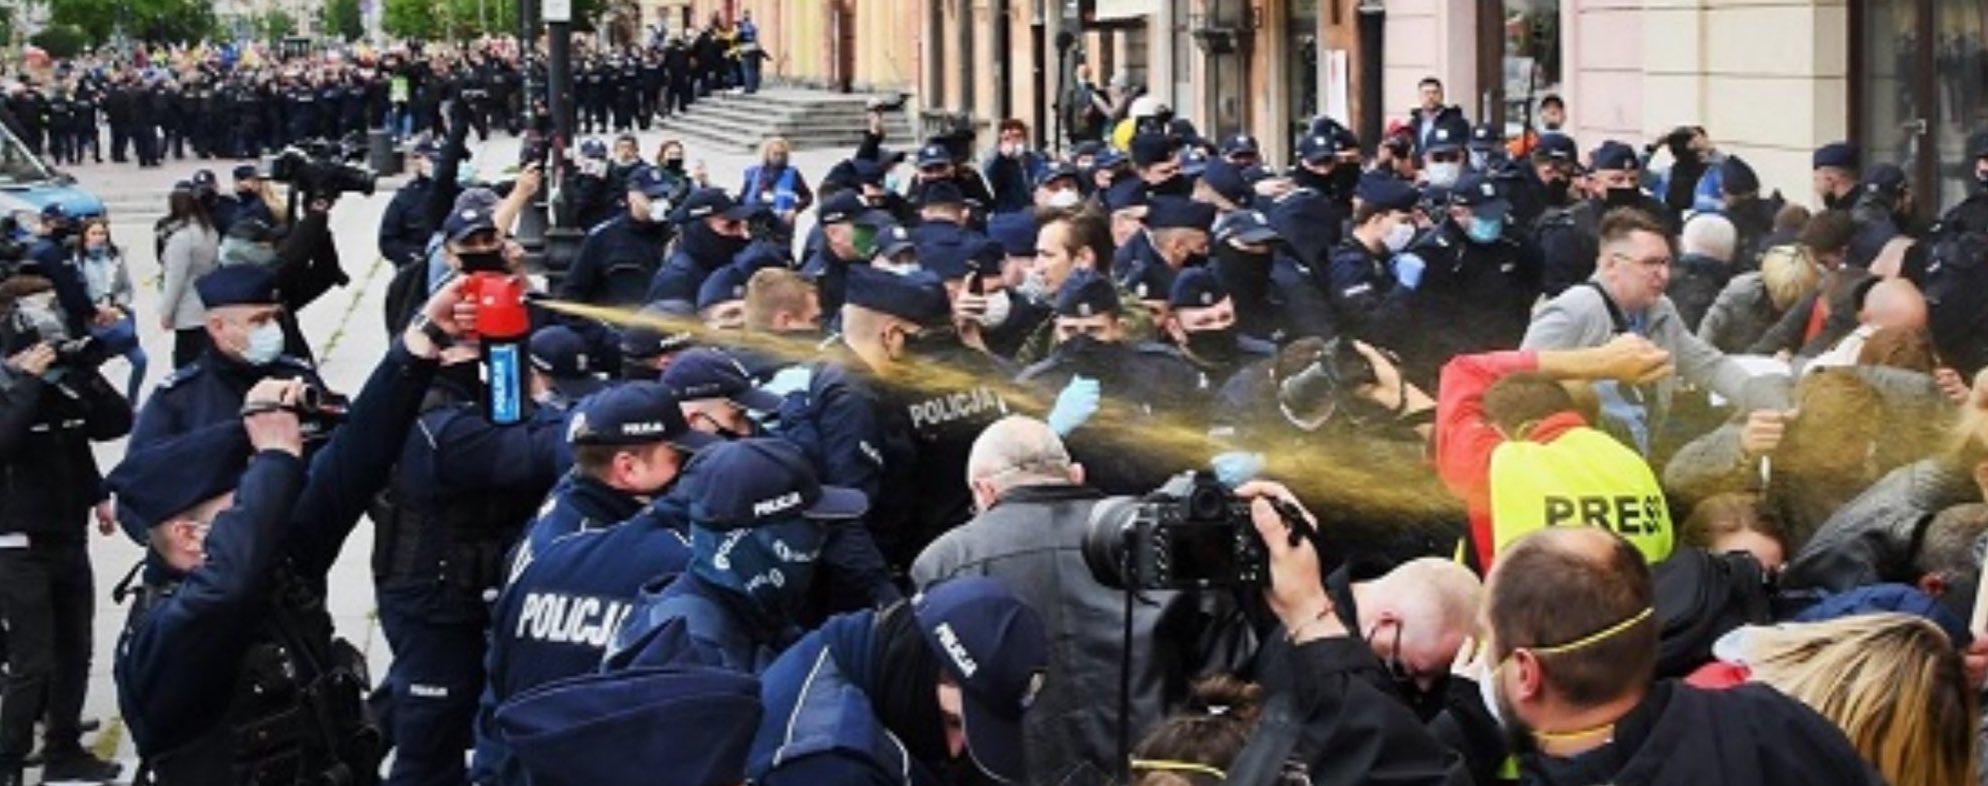 Warsaw riot